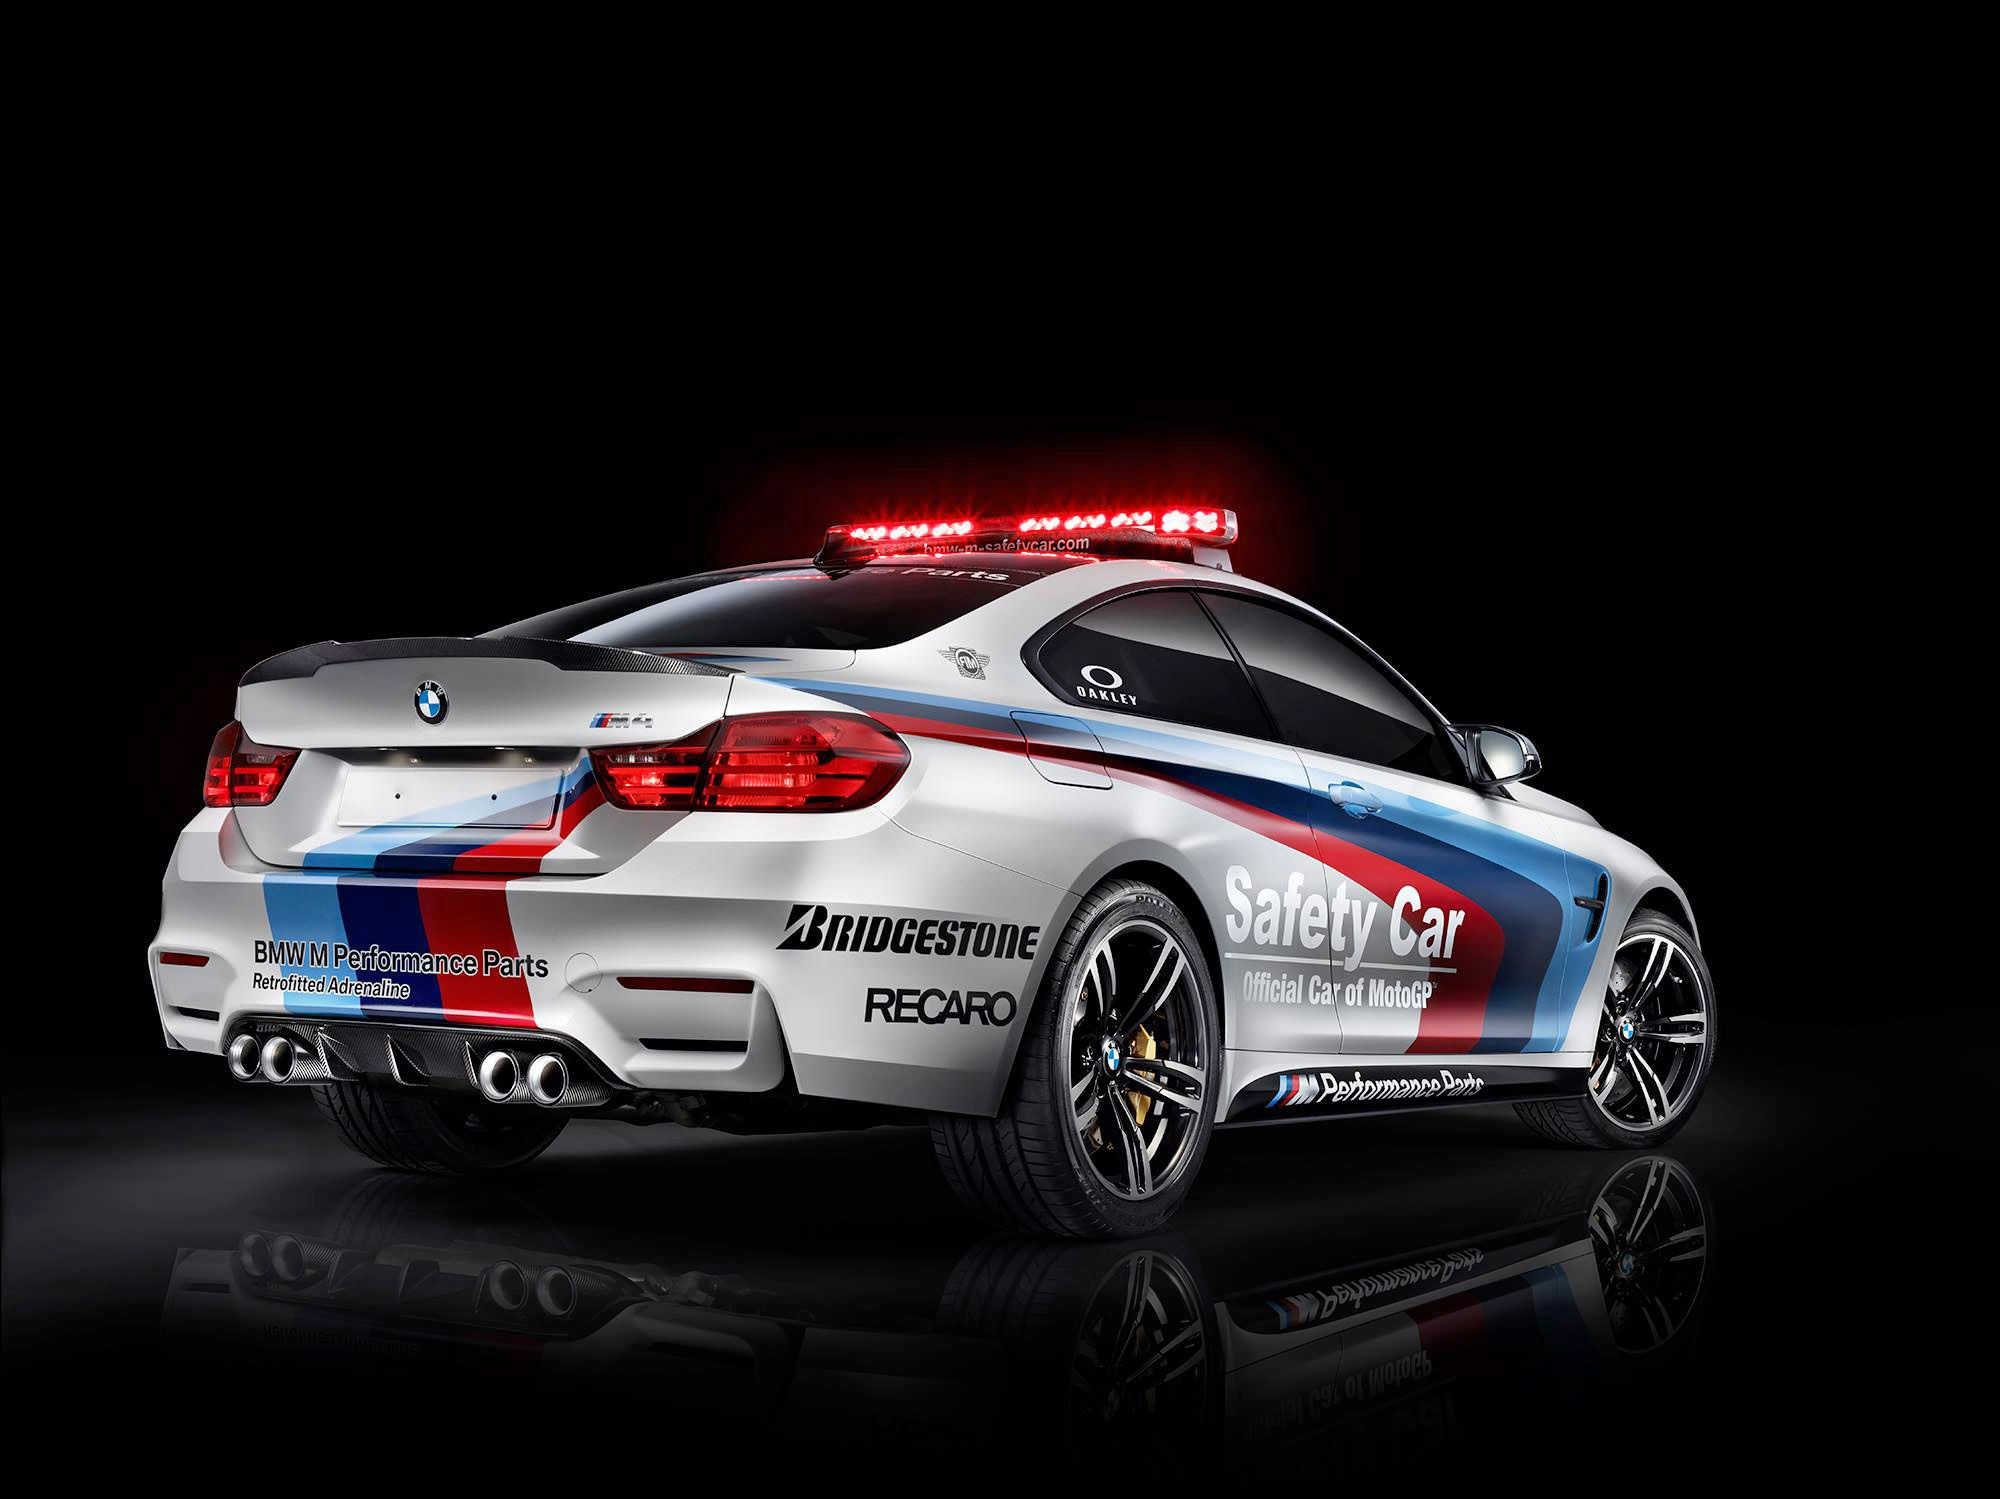 2014 BMW MotoGP M4 Safety Car Bmw m4, Motogp, Modelauto